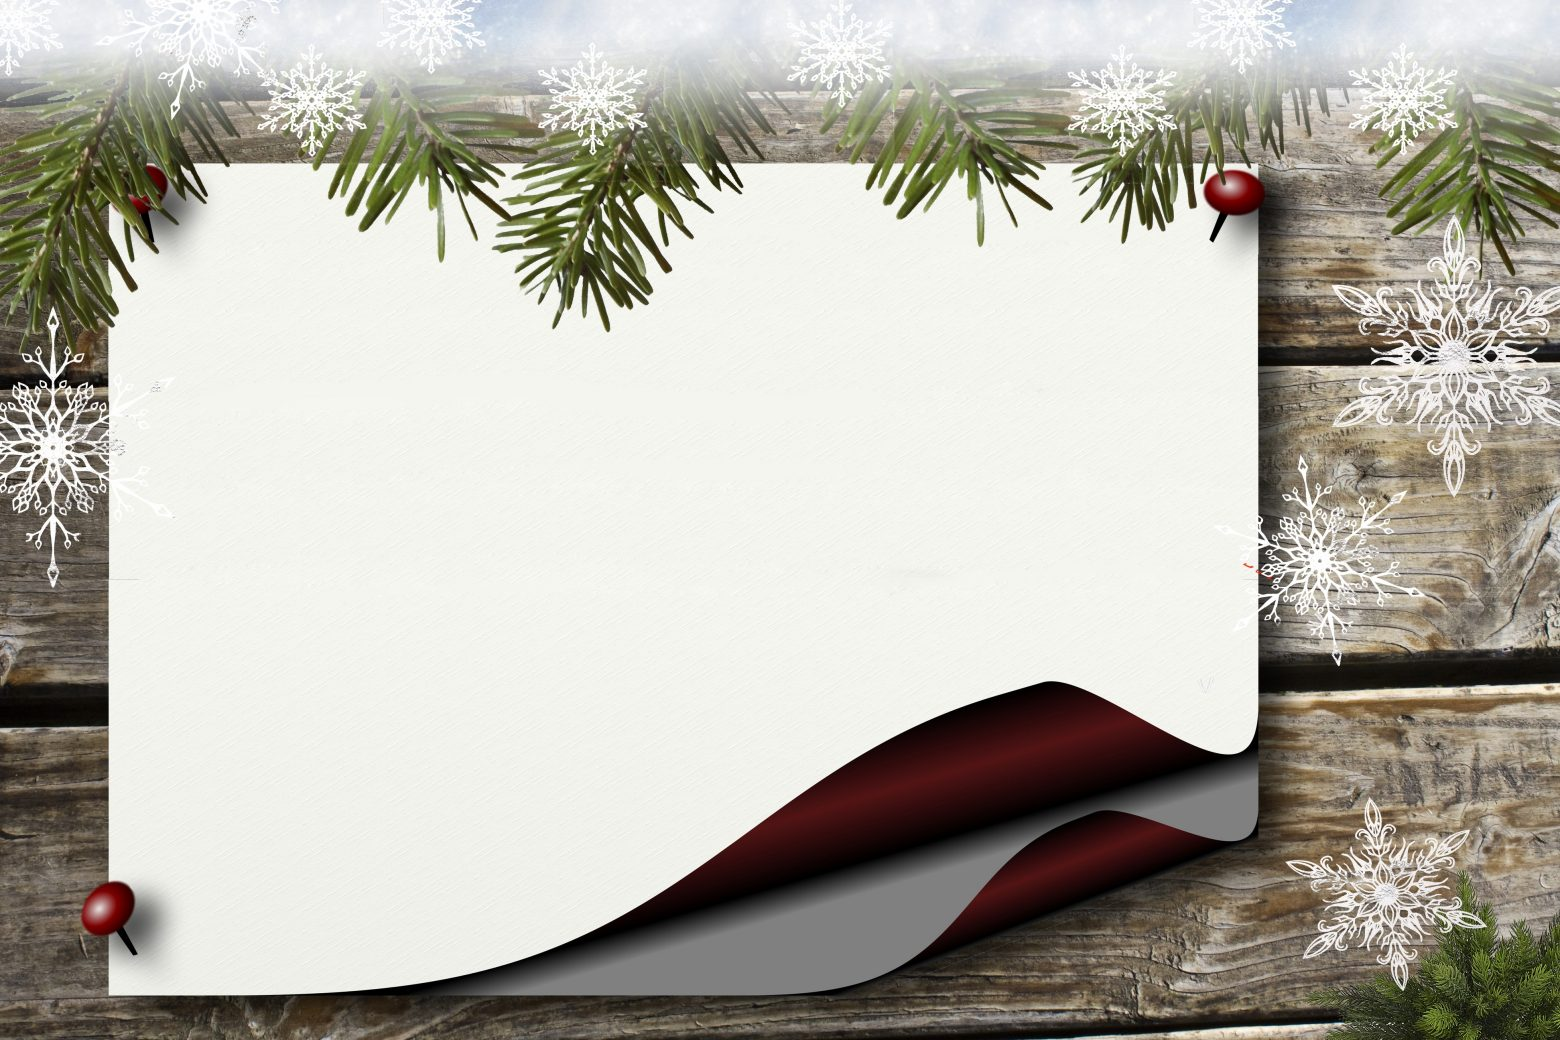 bulletin-board-541761